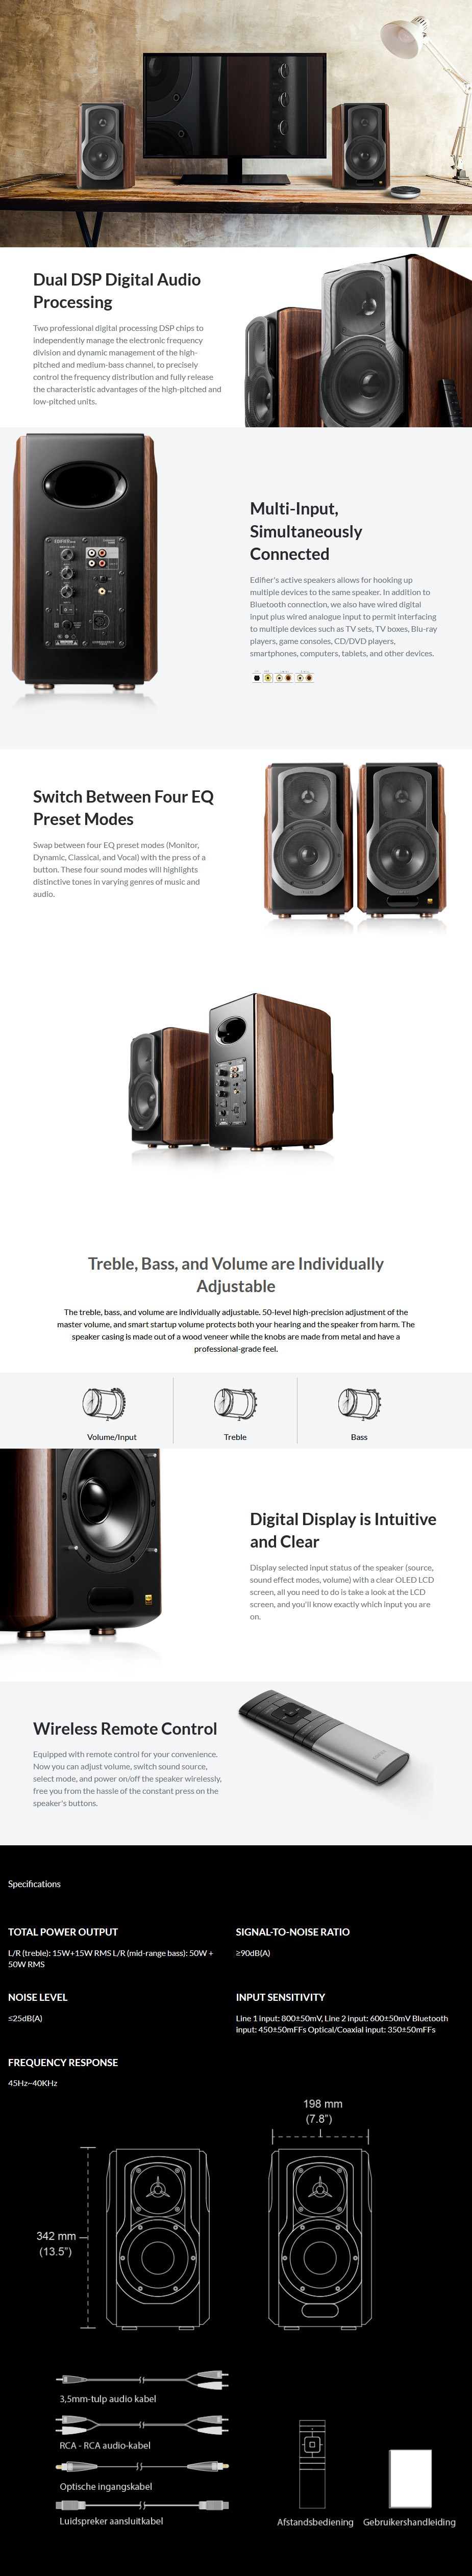 edifier-s2000mkiii-20-liaafestyle-active-bookshelf-bluetooth-studio-speakers-ac35417-5.jpg